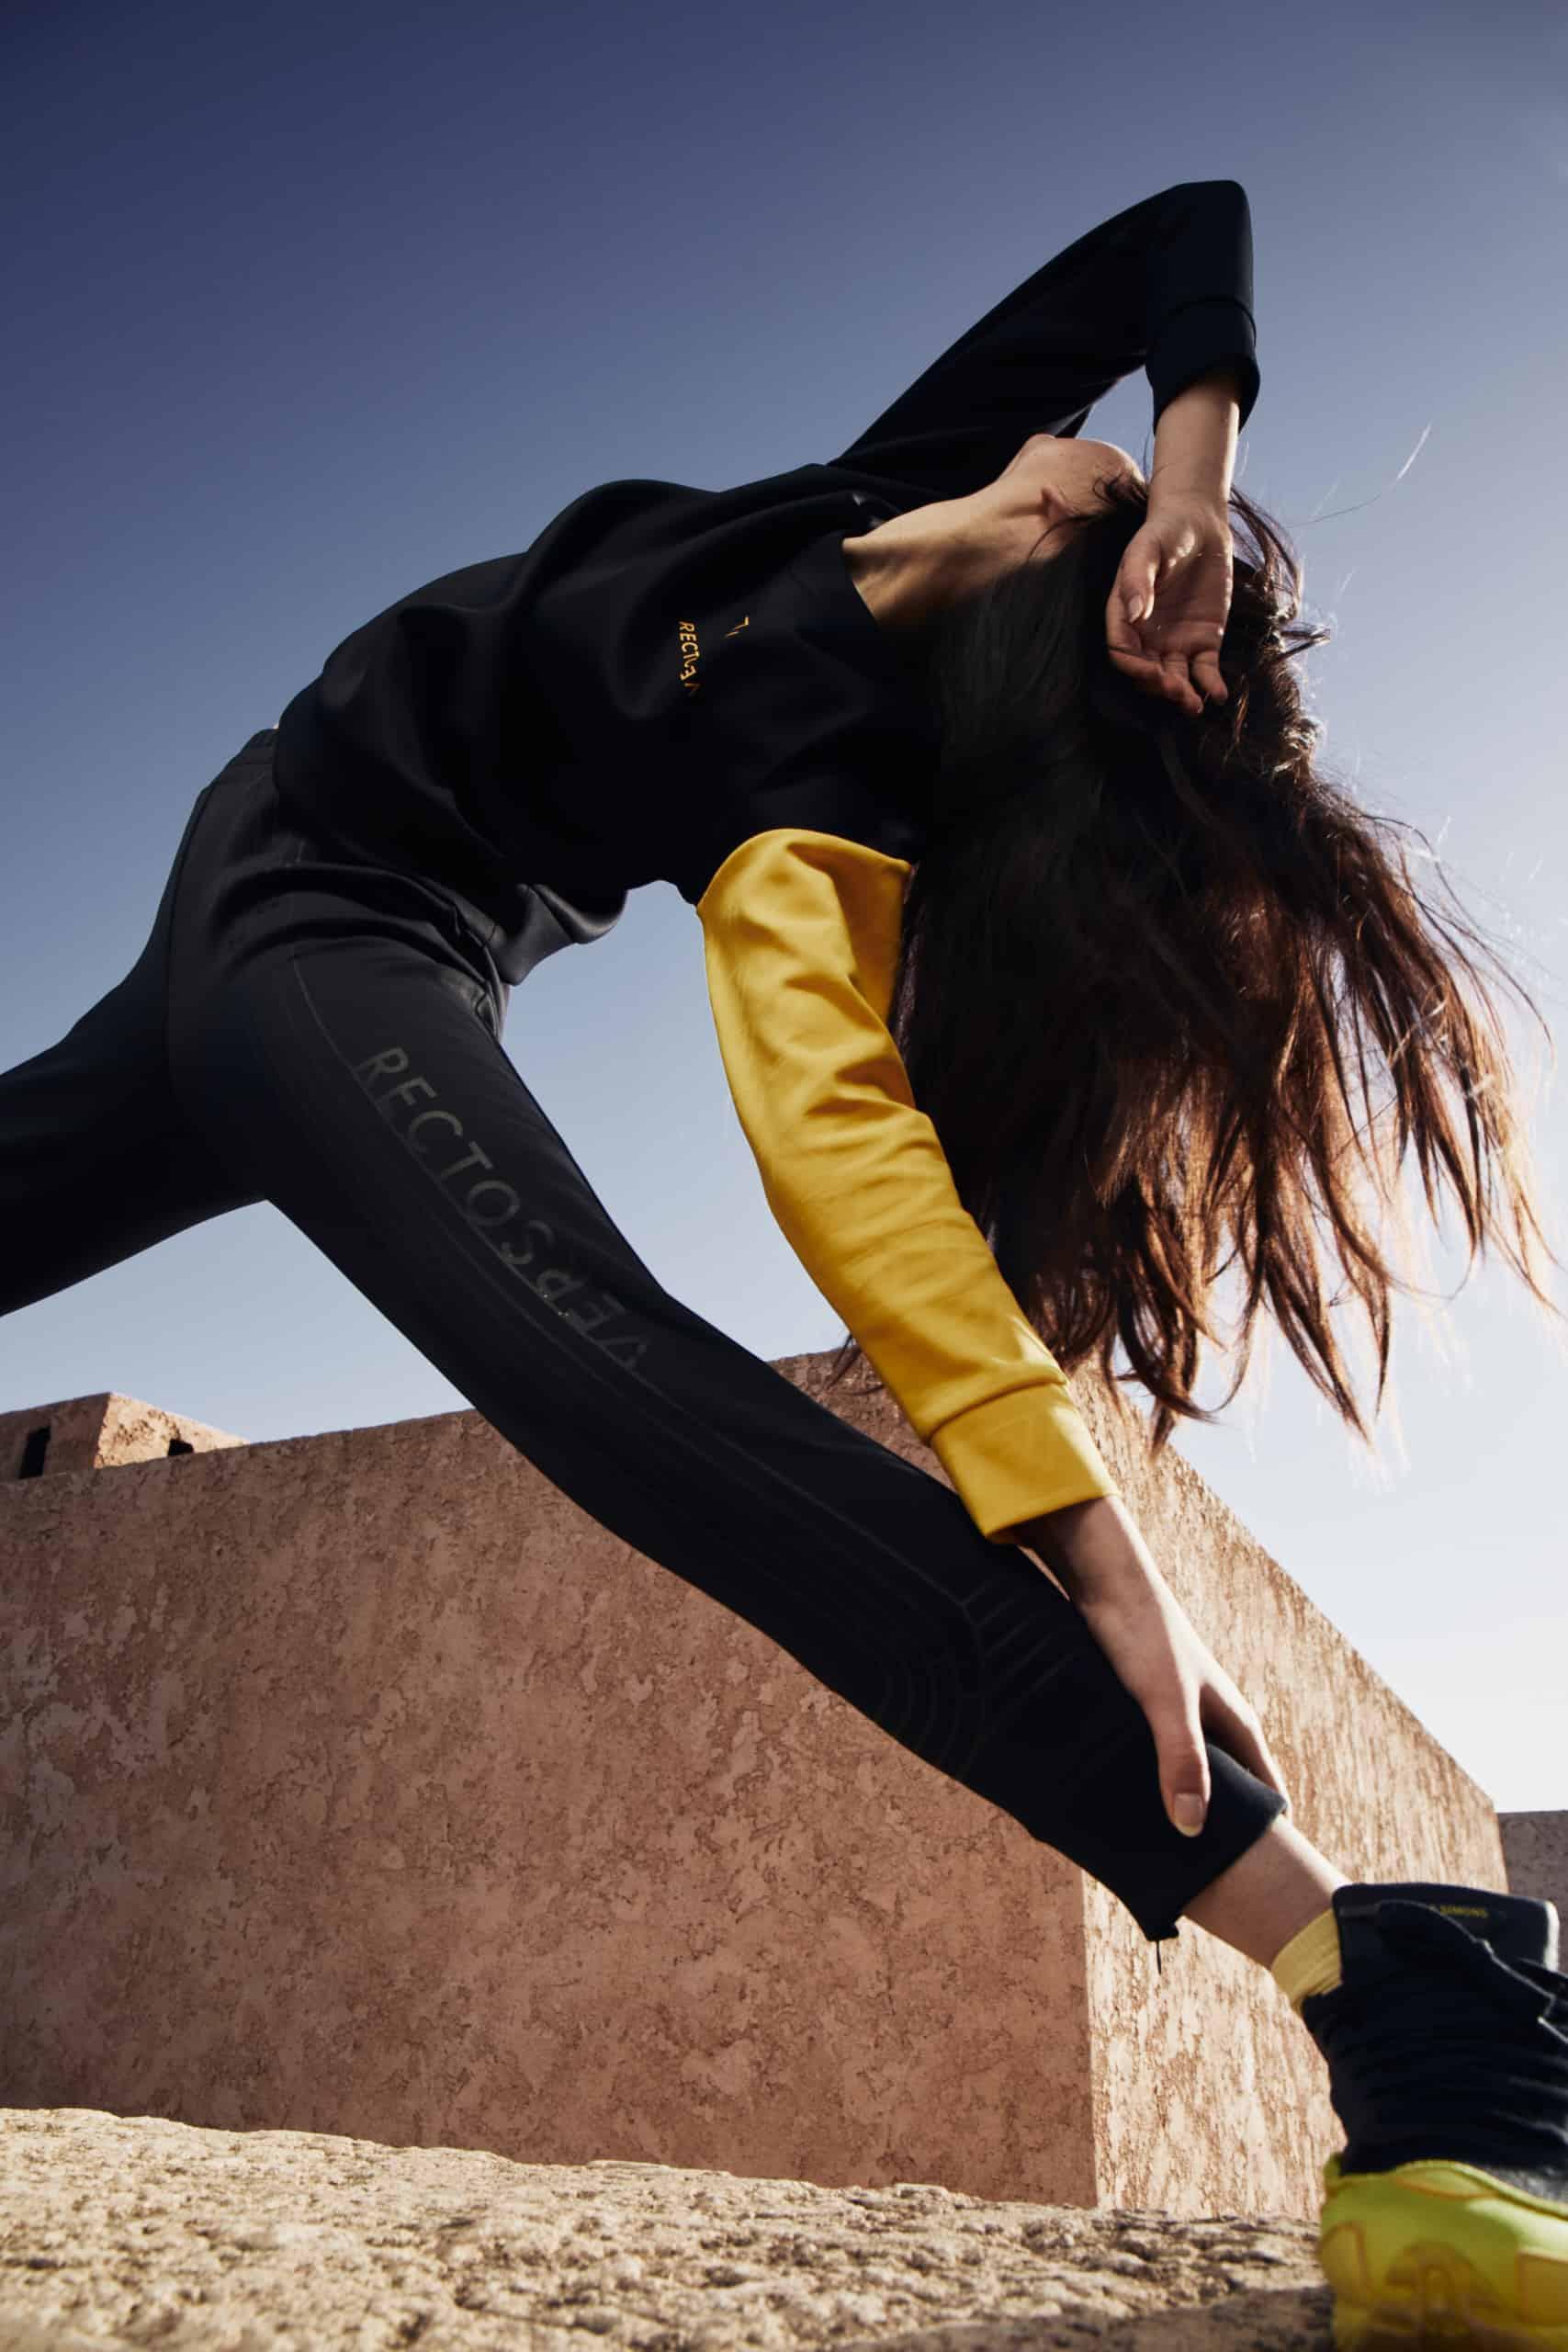 rv-c1-air-wall-black-pants-yellow